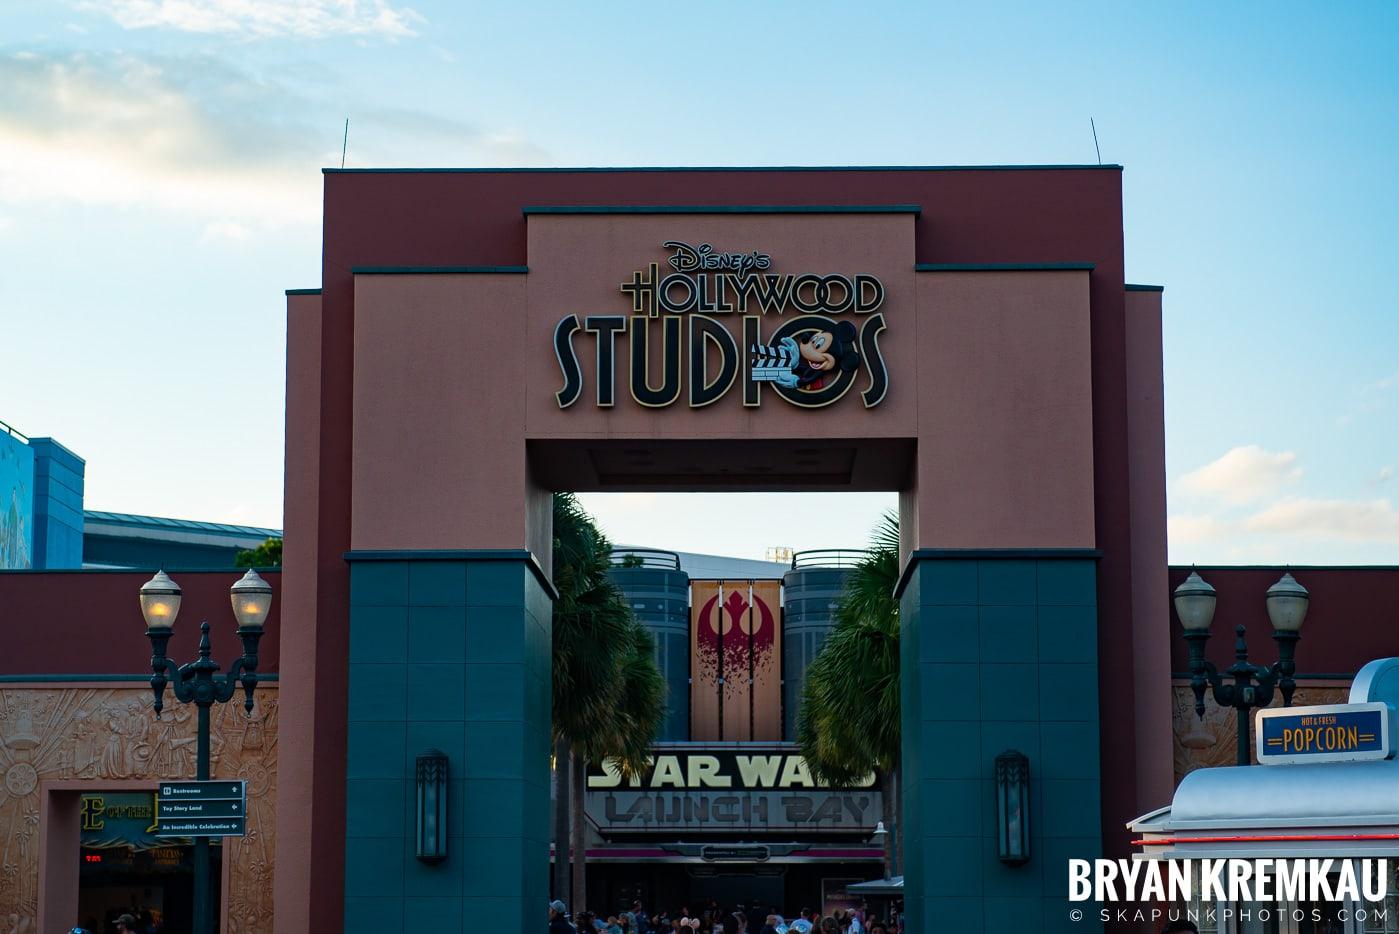 Walt Disney World Vacation: Day 5 (Animal Kingdom / Disney's Hollywood Studios) - 10.3.19 (50)